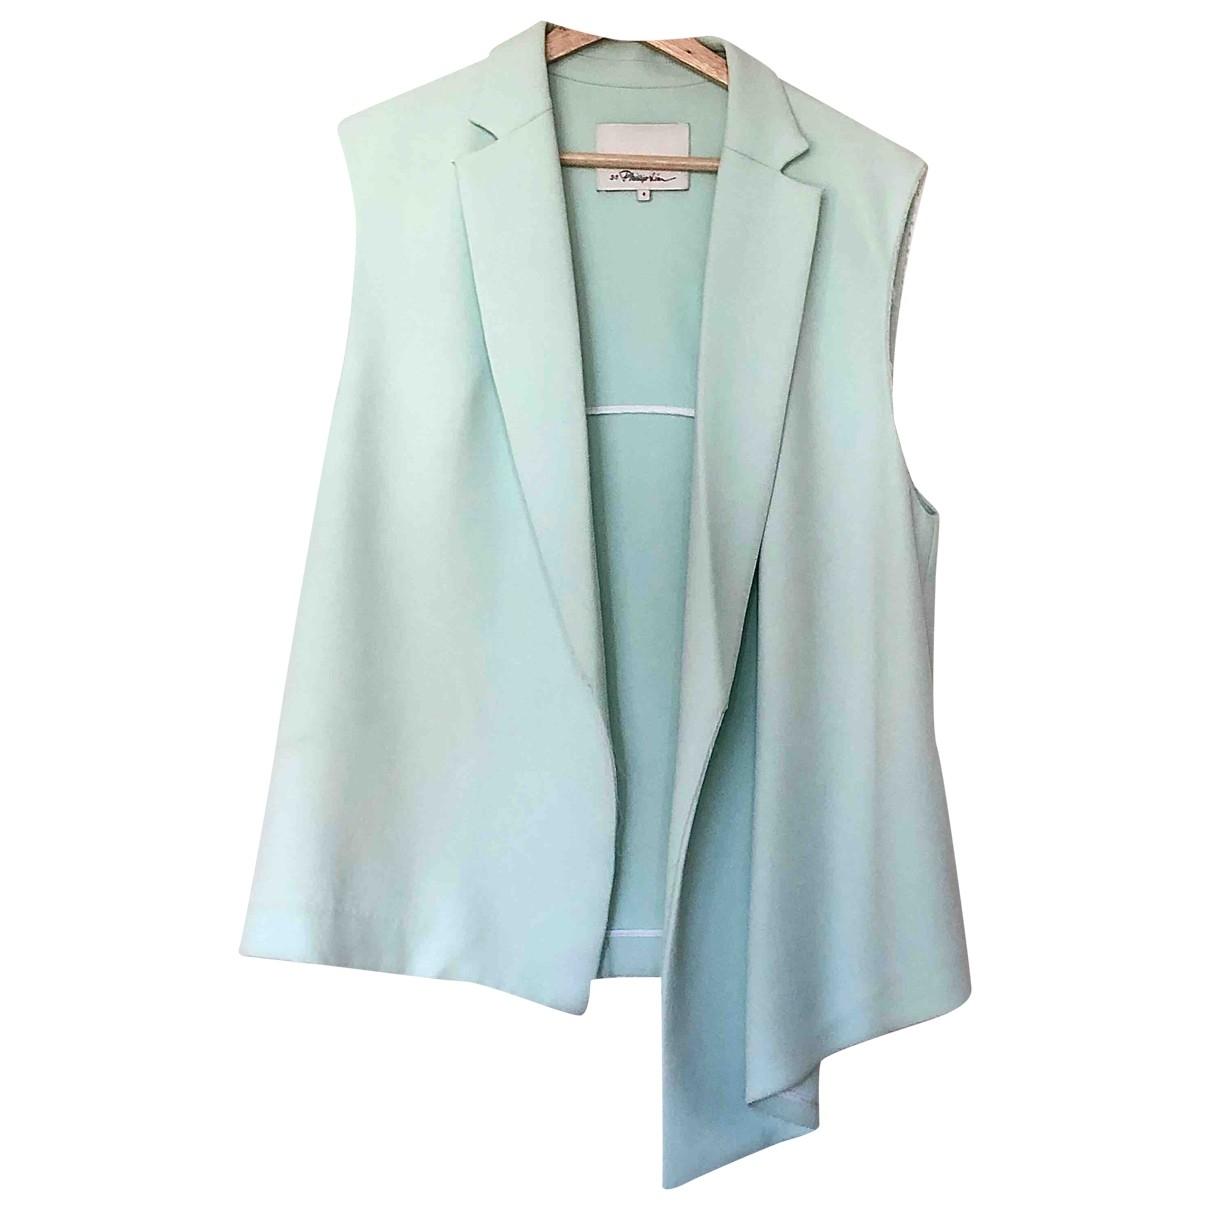 3.1 Phillip Lim \N Green jacket for Women 4 US